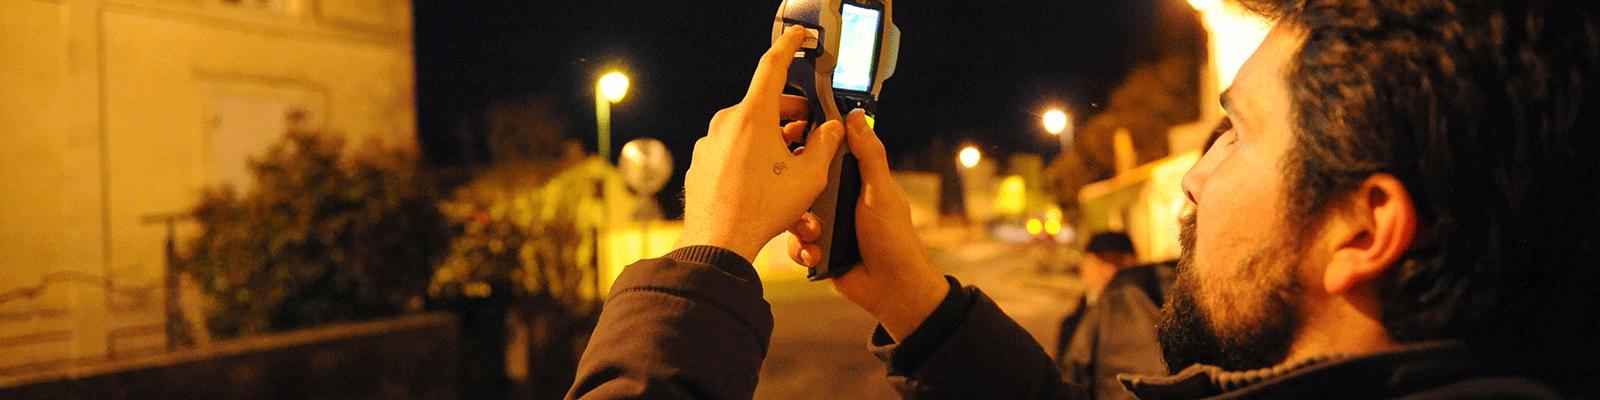 image de couverture balade thermographique